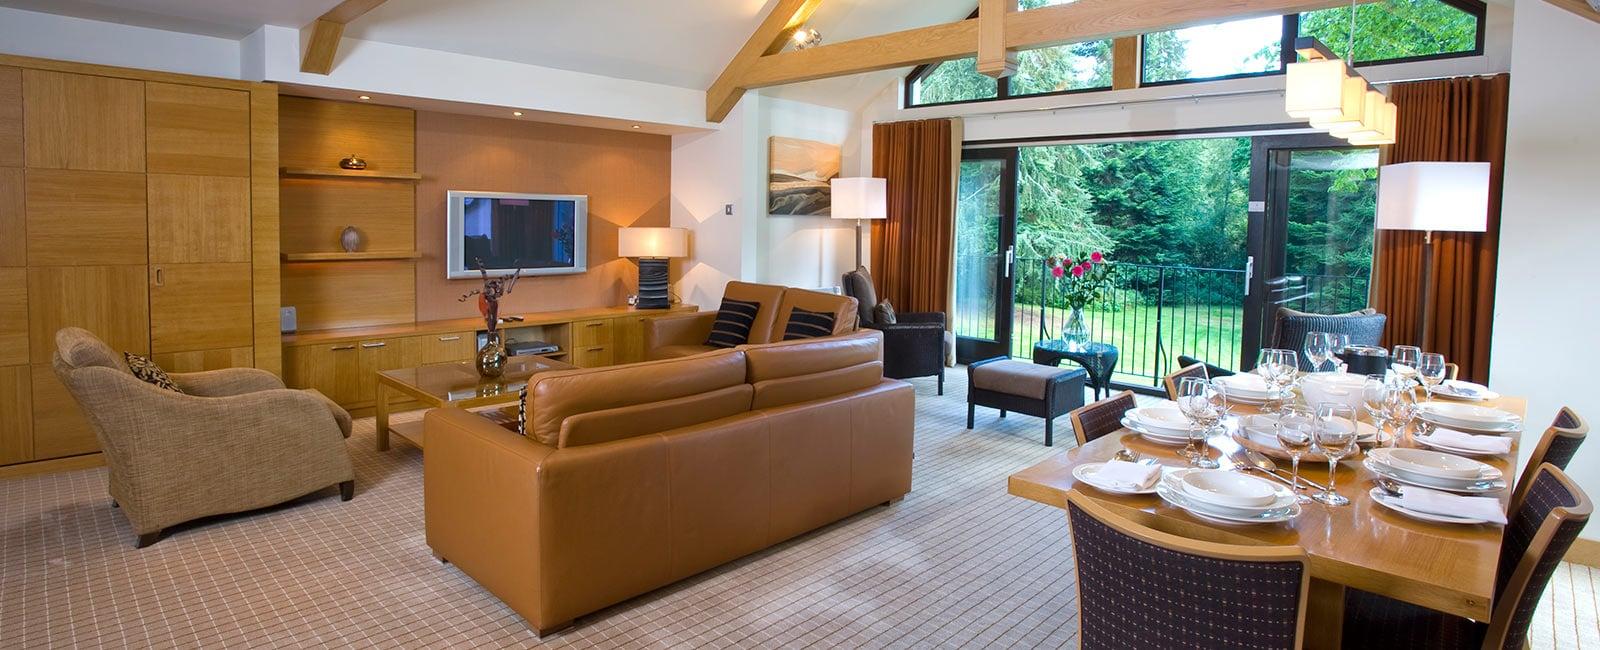 Hilton Grand Vacations Club Resort at Dunkeld in Perthshire